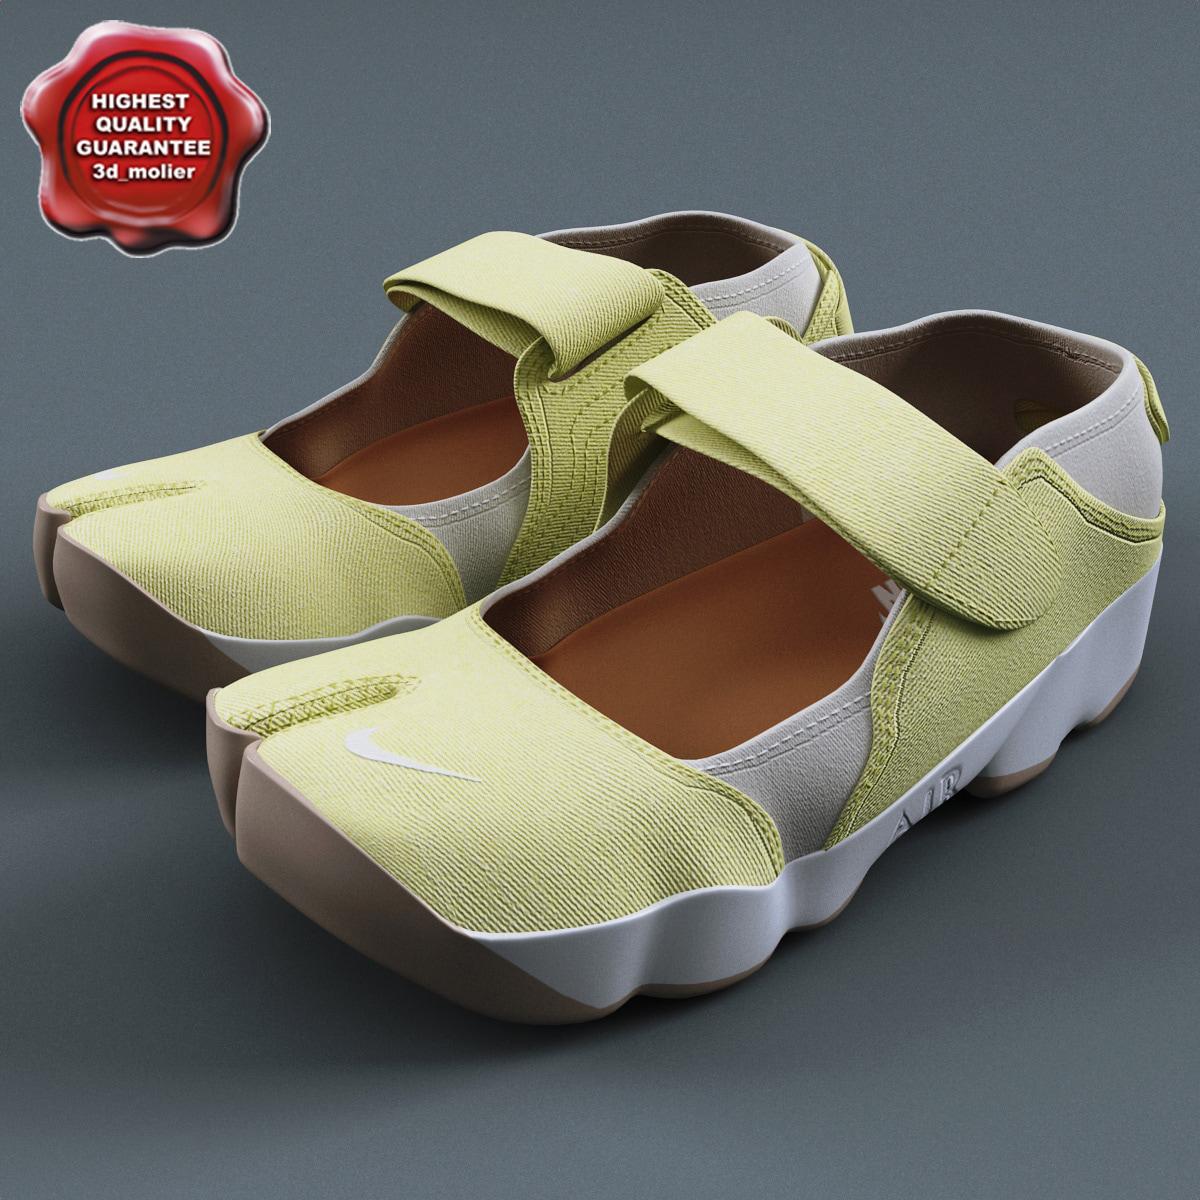 Sneakers_Nike_Air_Rift_00.jpg